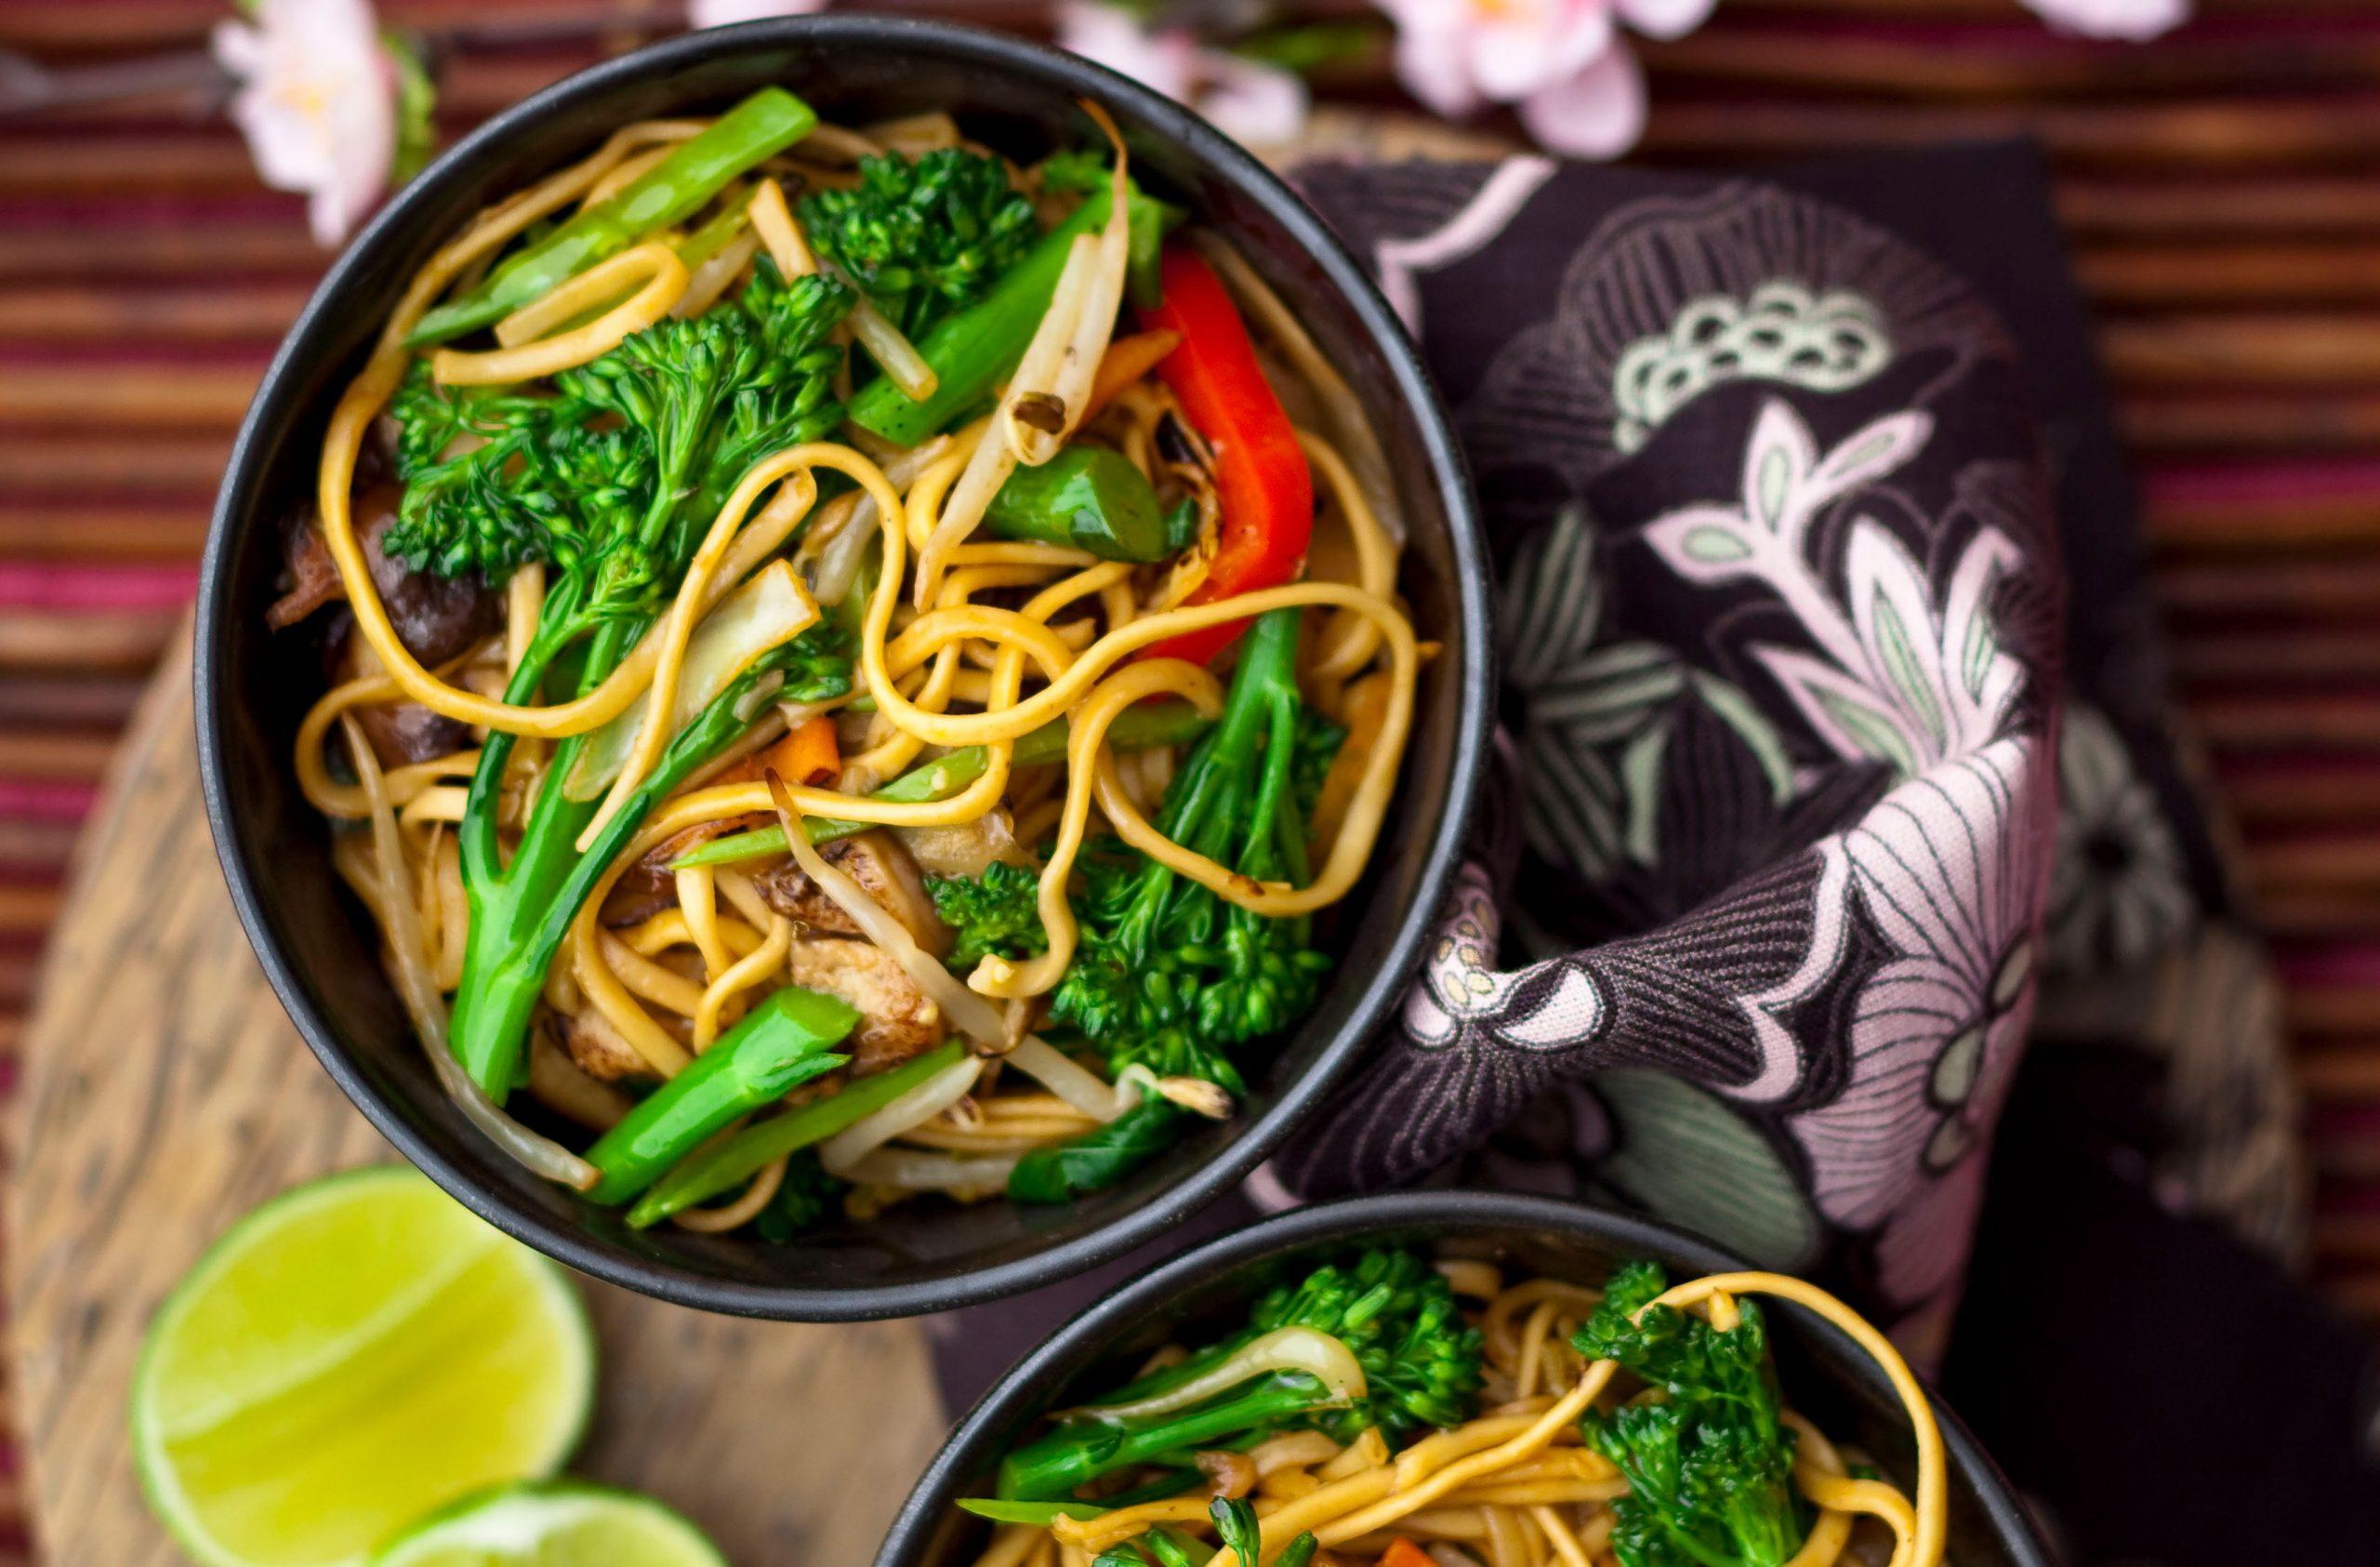 Chow mein aux légumes chinois